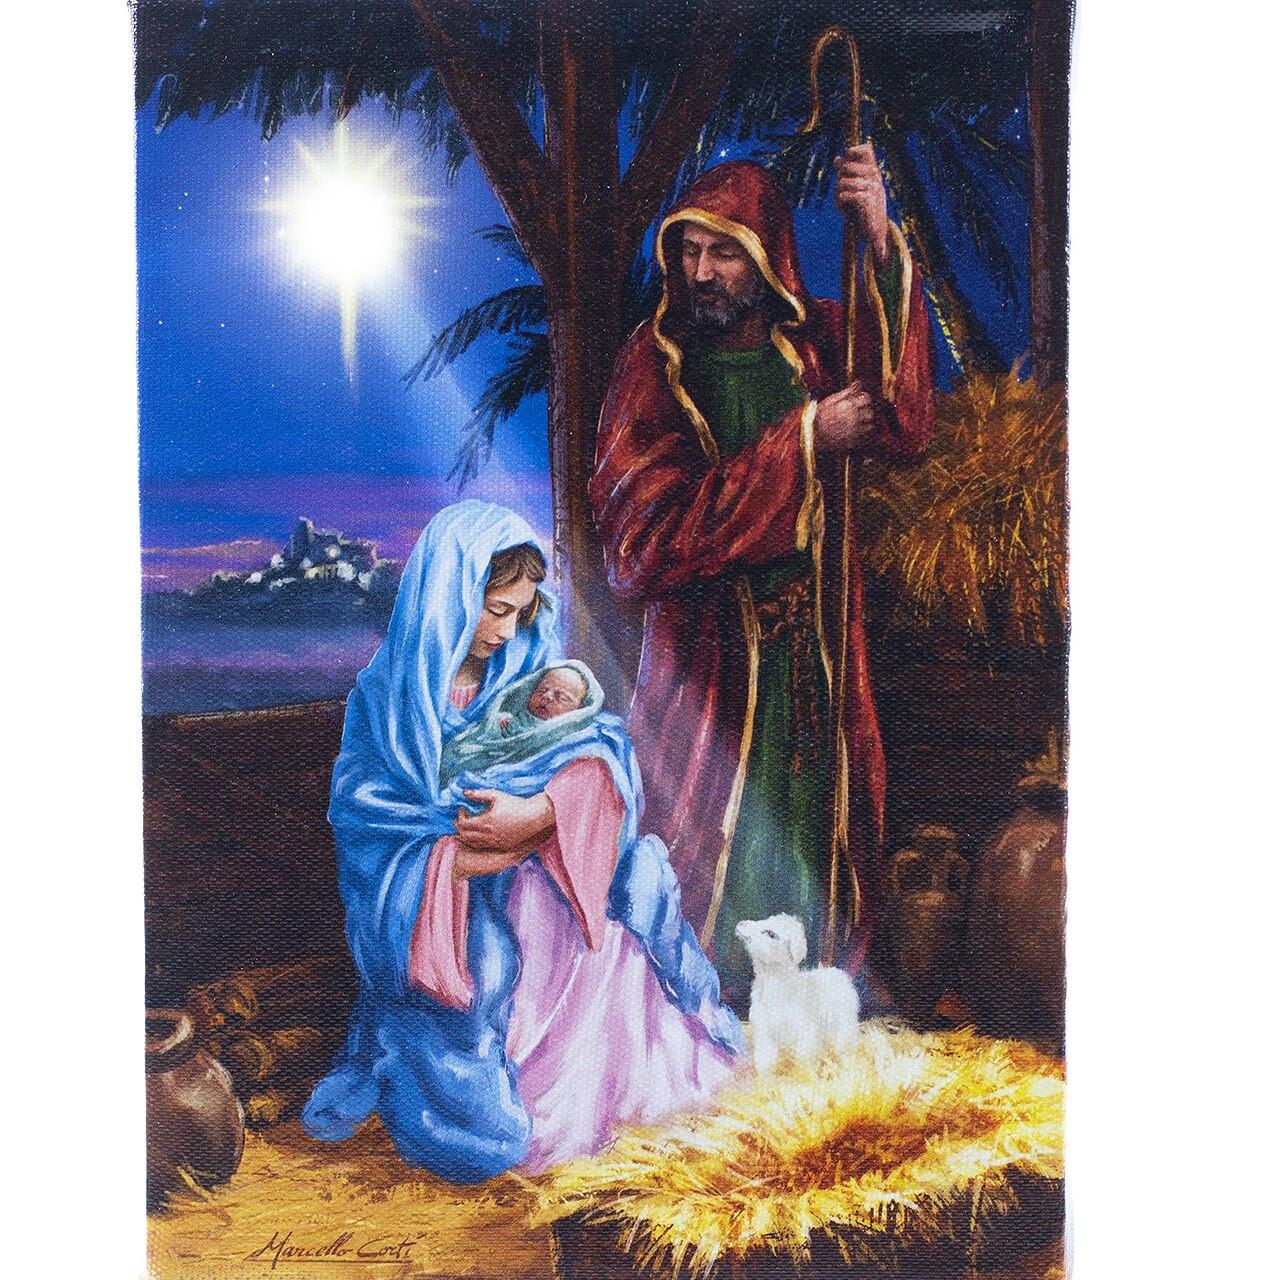 Manger Scene Wall Art Star Of Bethlehem Lighted Canvas 7 X 8 1 4 197346 F C Ziegler Company